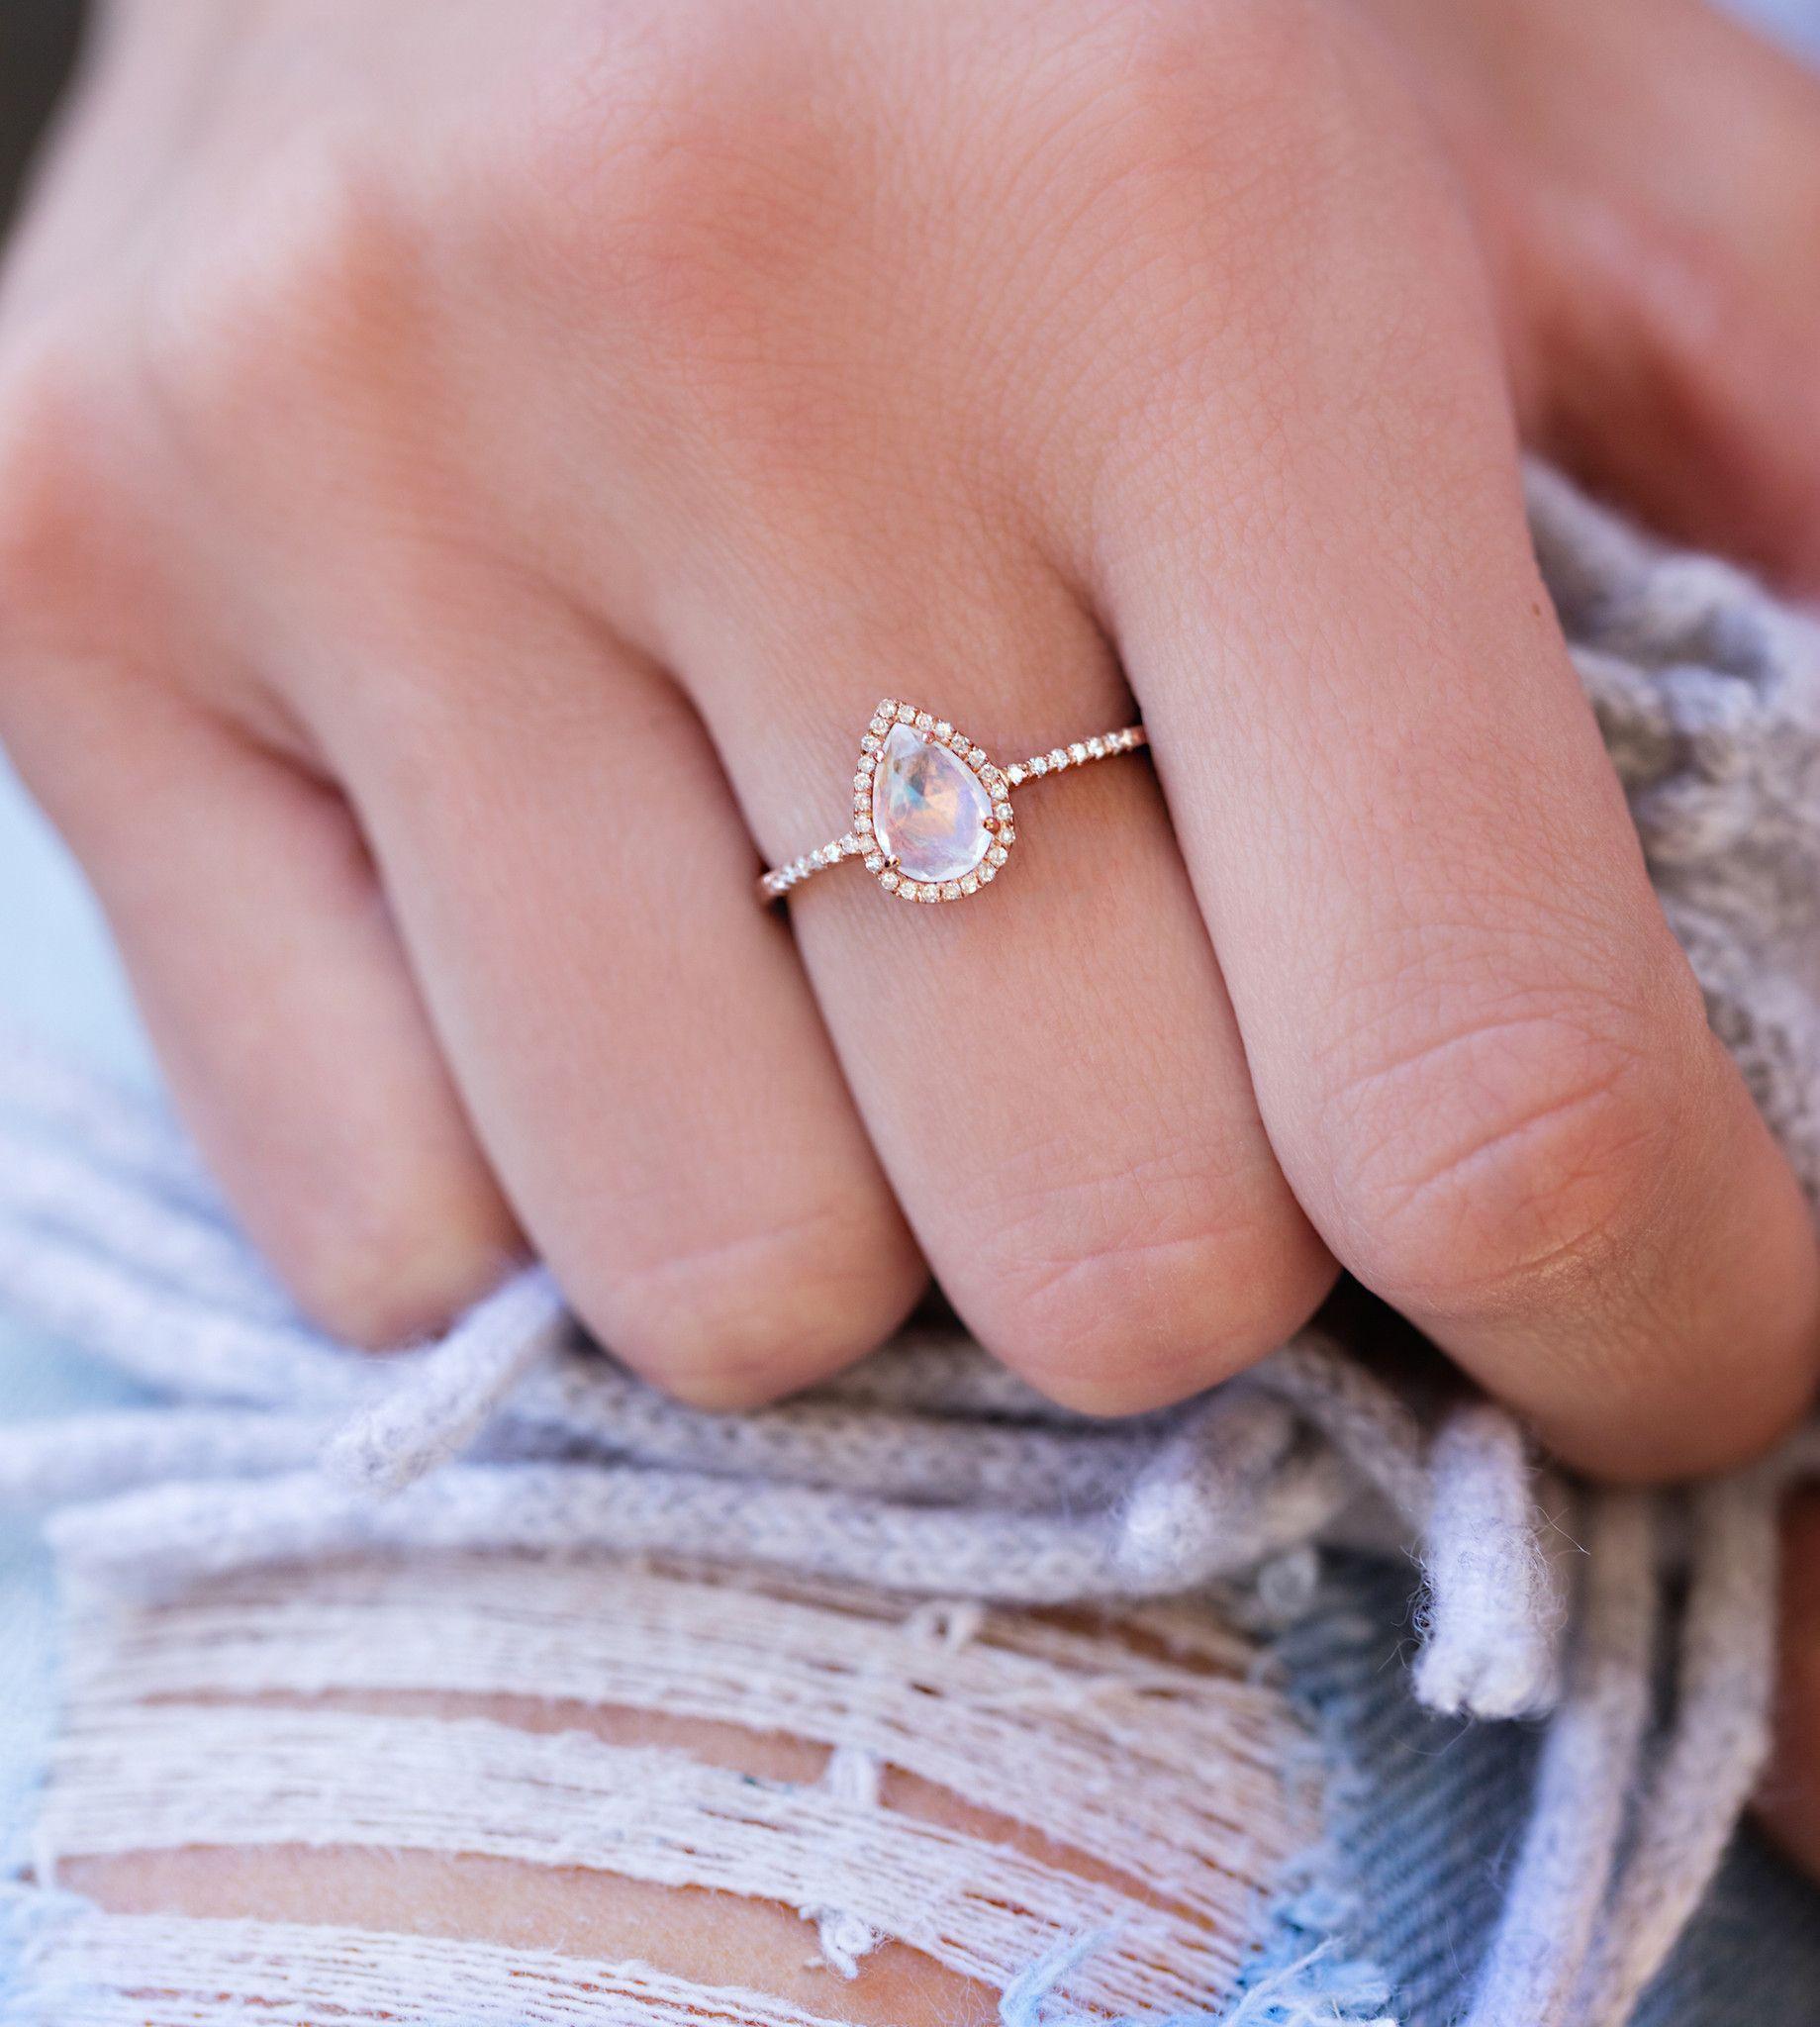 14kt Gold And Diamond Single Band Teardrop Moonstone Ring Trending Engagement Rings Wedding Rings Teardrop Moonstone Engagement Ring